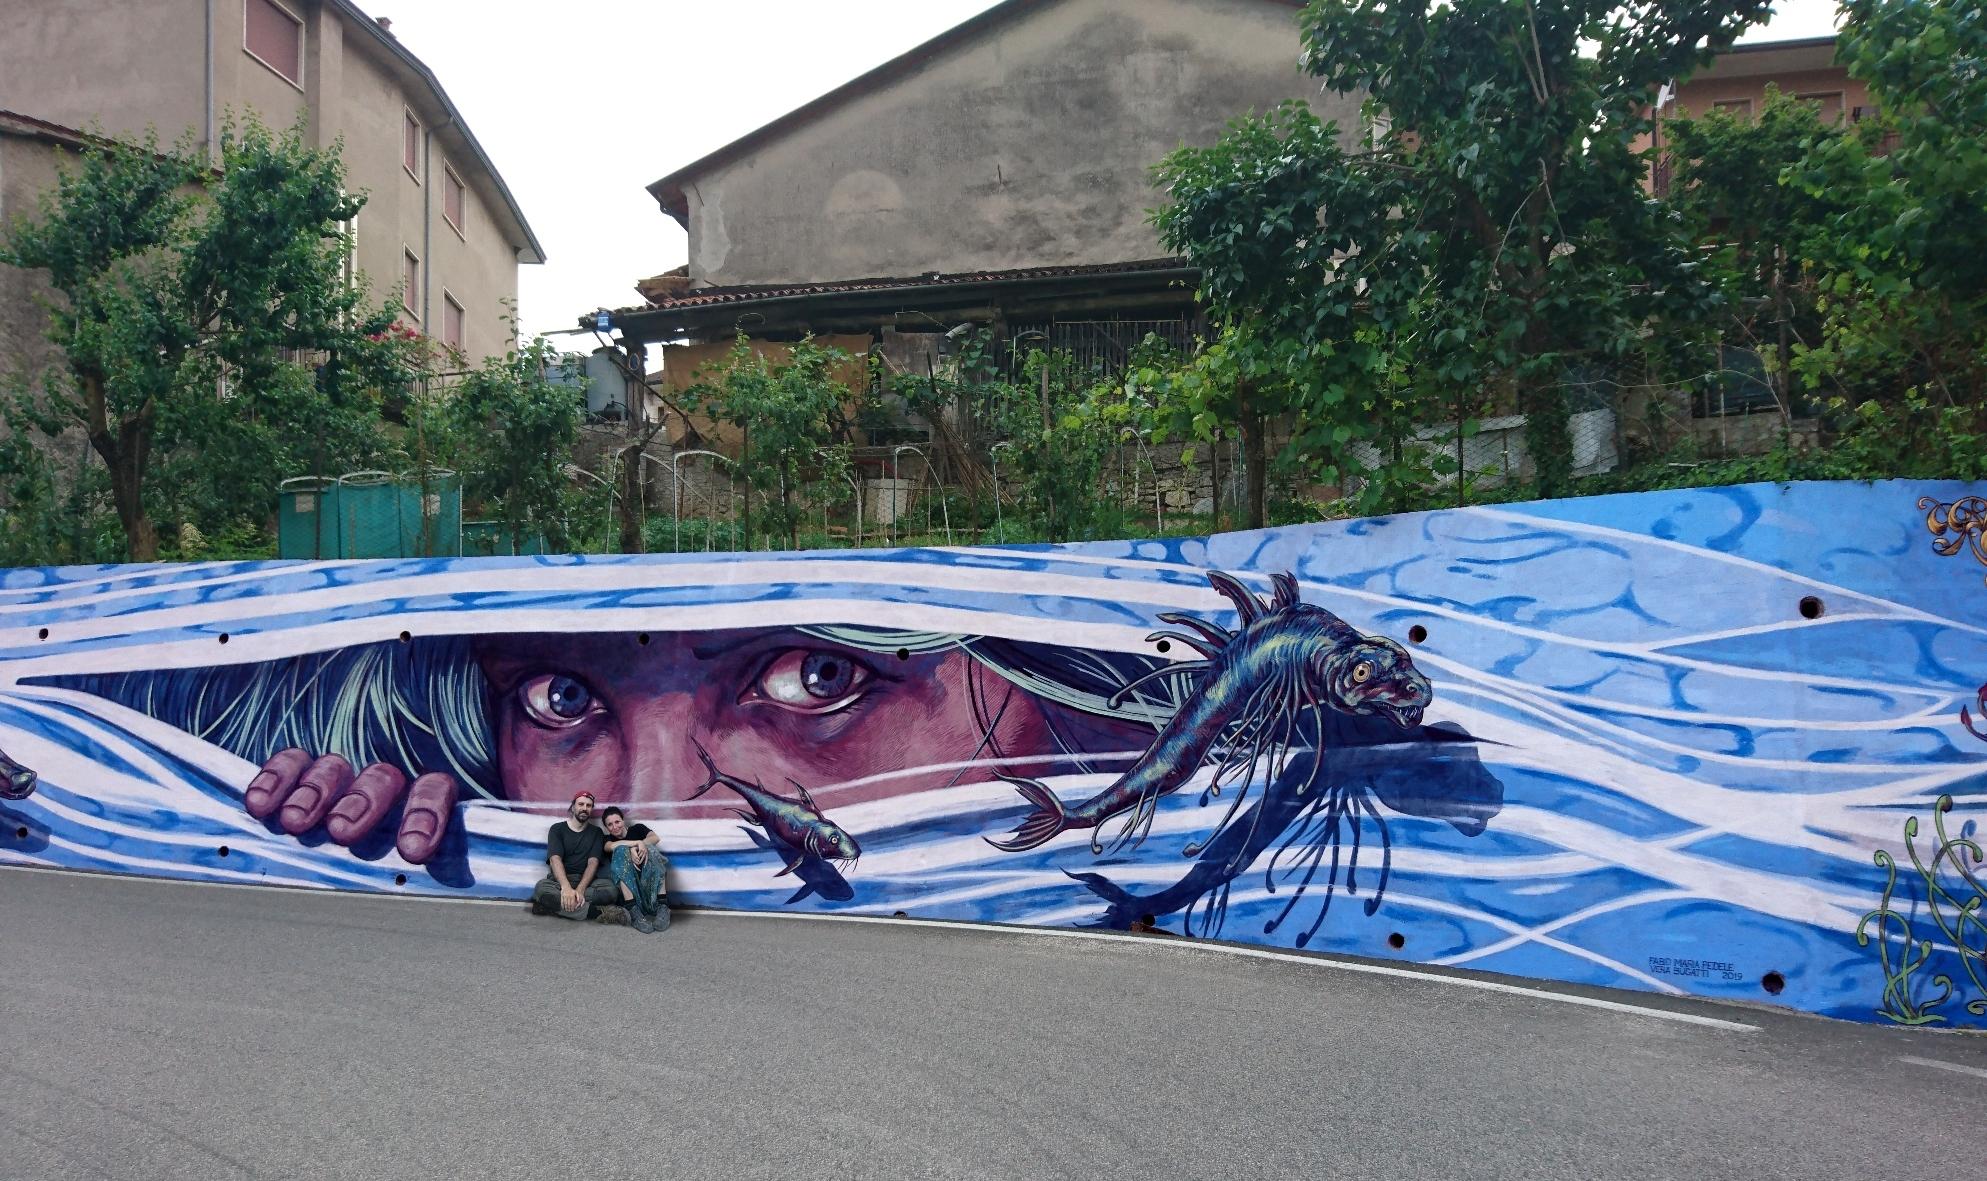 verabugatti streetart murals walls arteurbana illusioniottiche 3Dstreetart anamorfosi arte3D fabiofedele crespadoro anguane fishes